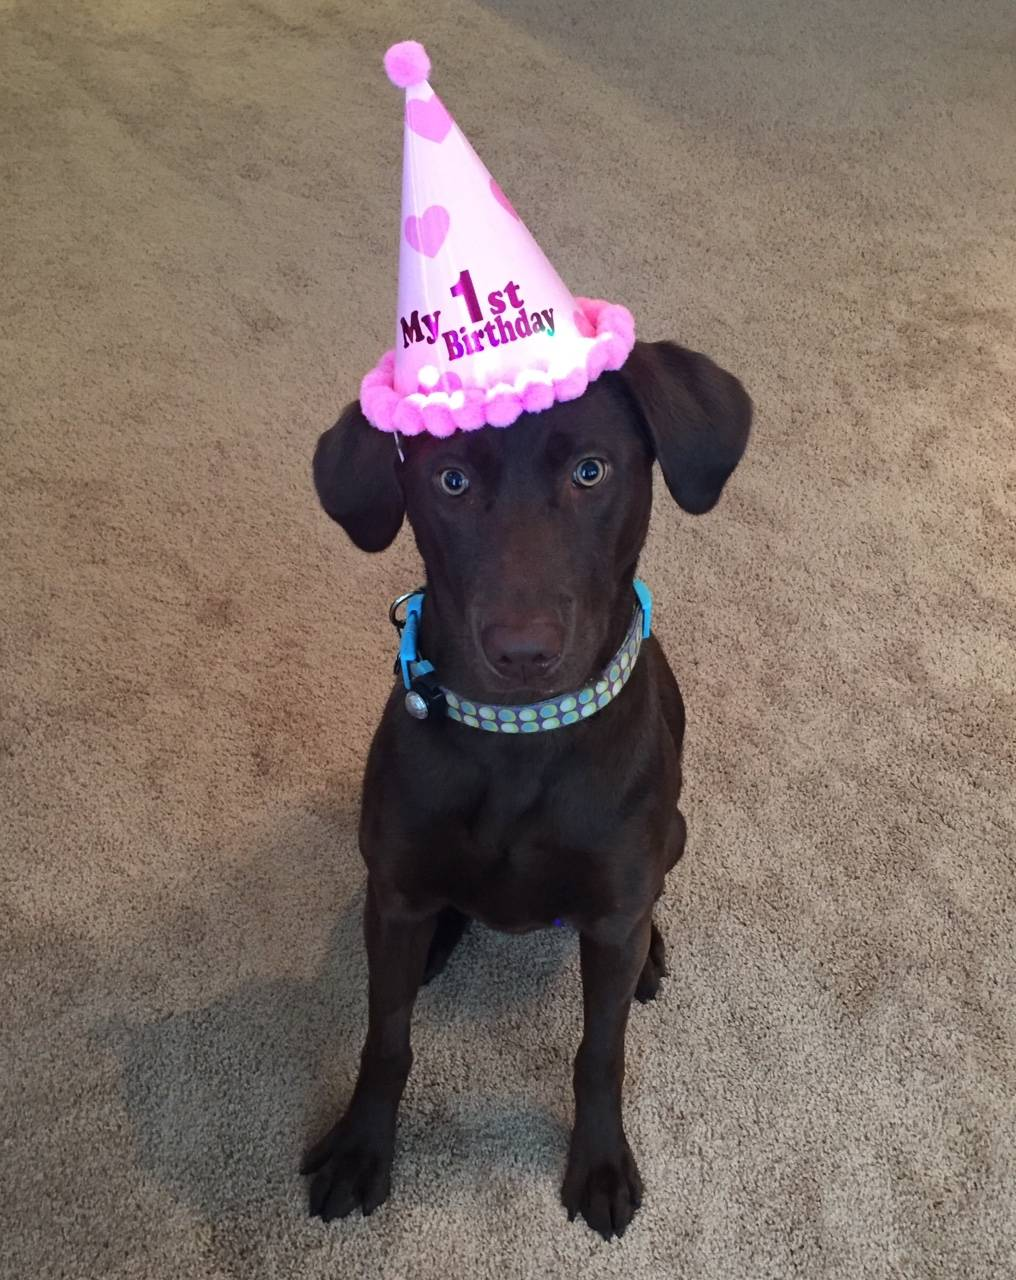 Beatrix on her 1st Birthday!!